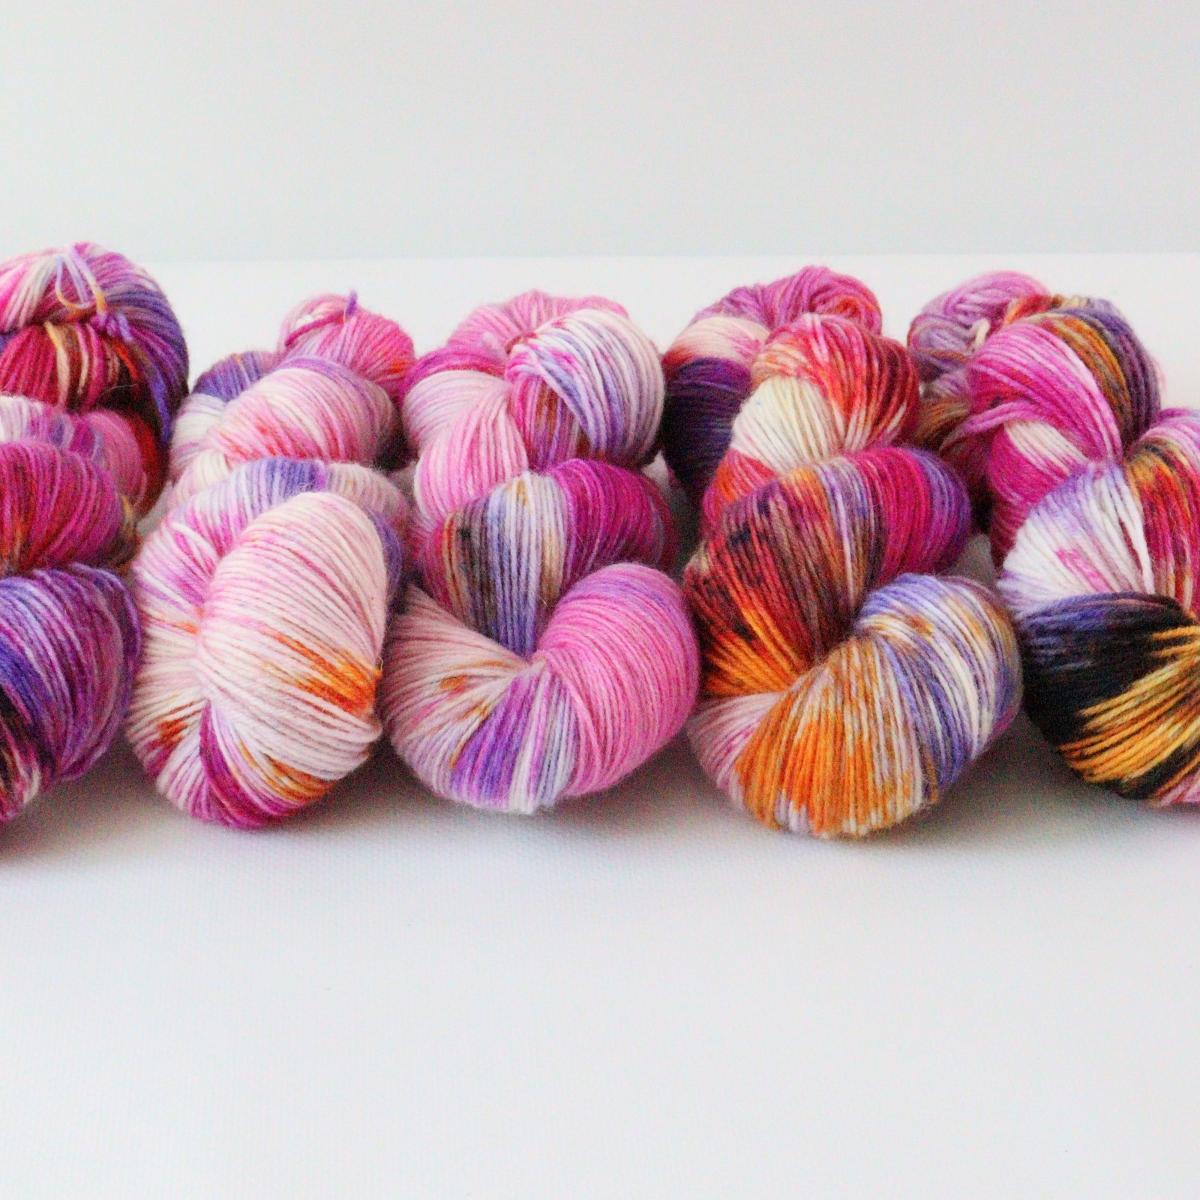 woodico.pro hand dyed yarn 084 3 1200x1200 - Hand dyed yarn / 084